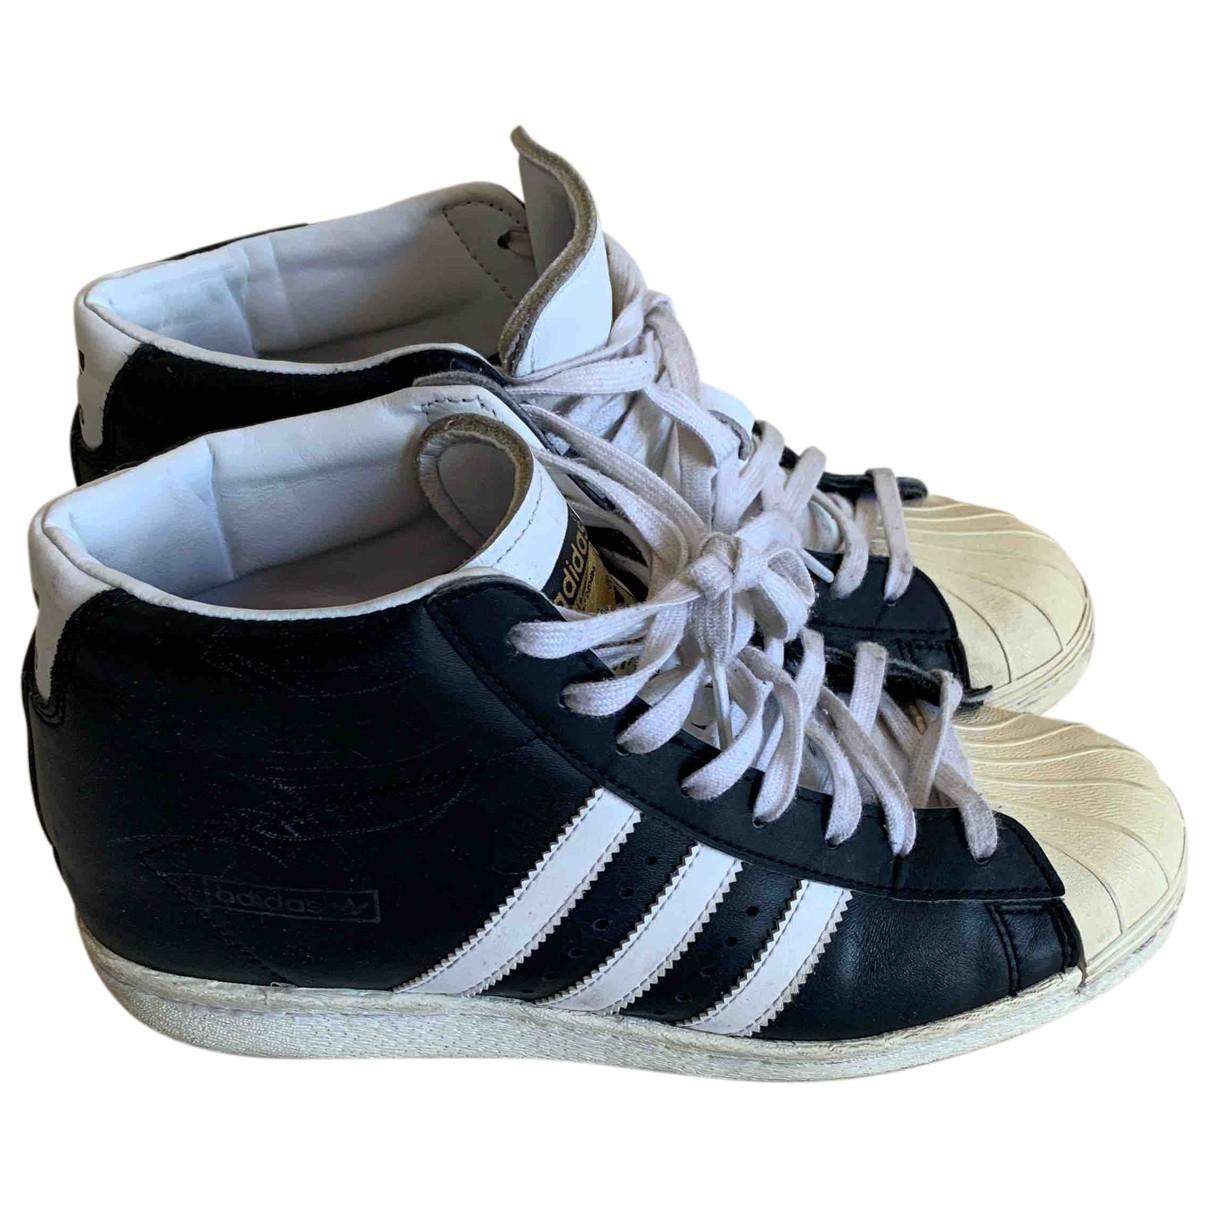 Adidas \N Espadrilles in  Schwarz Leder